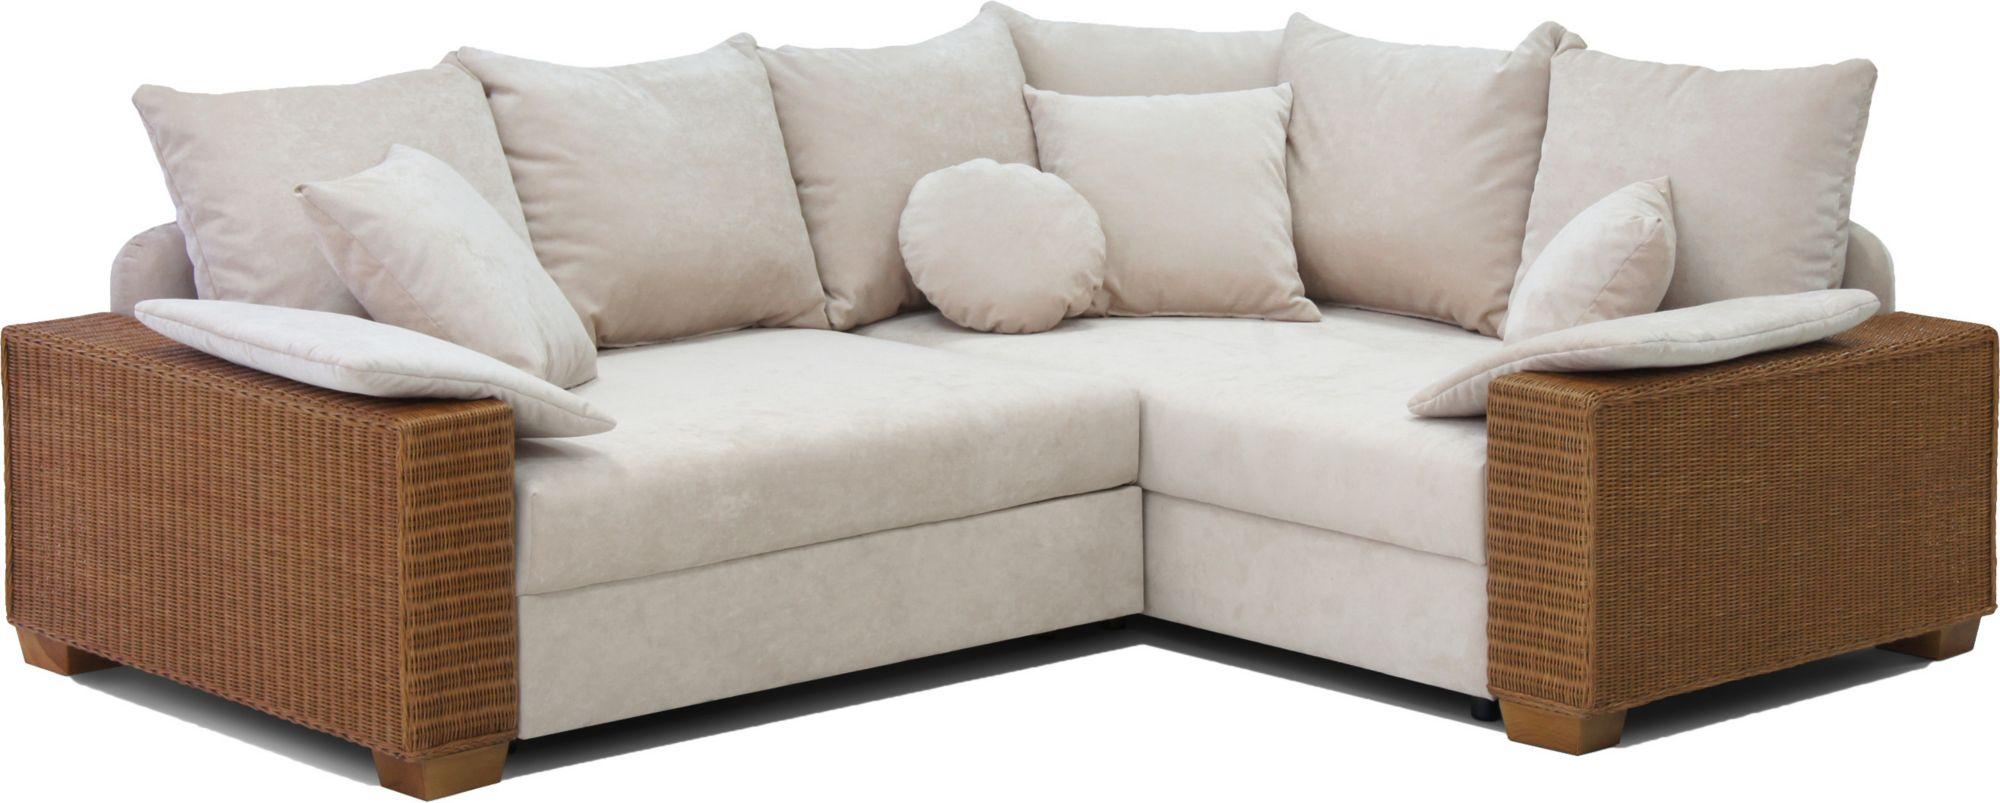 home affaire polsterecke kenia mit bettfunktion und. Black Bedroom Furniture Sets. Home Design Ideas